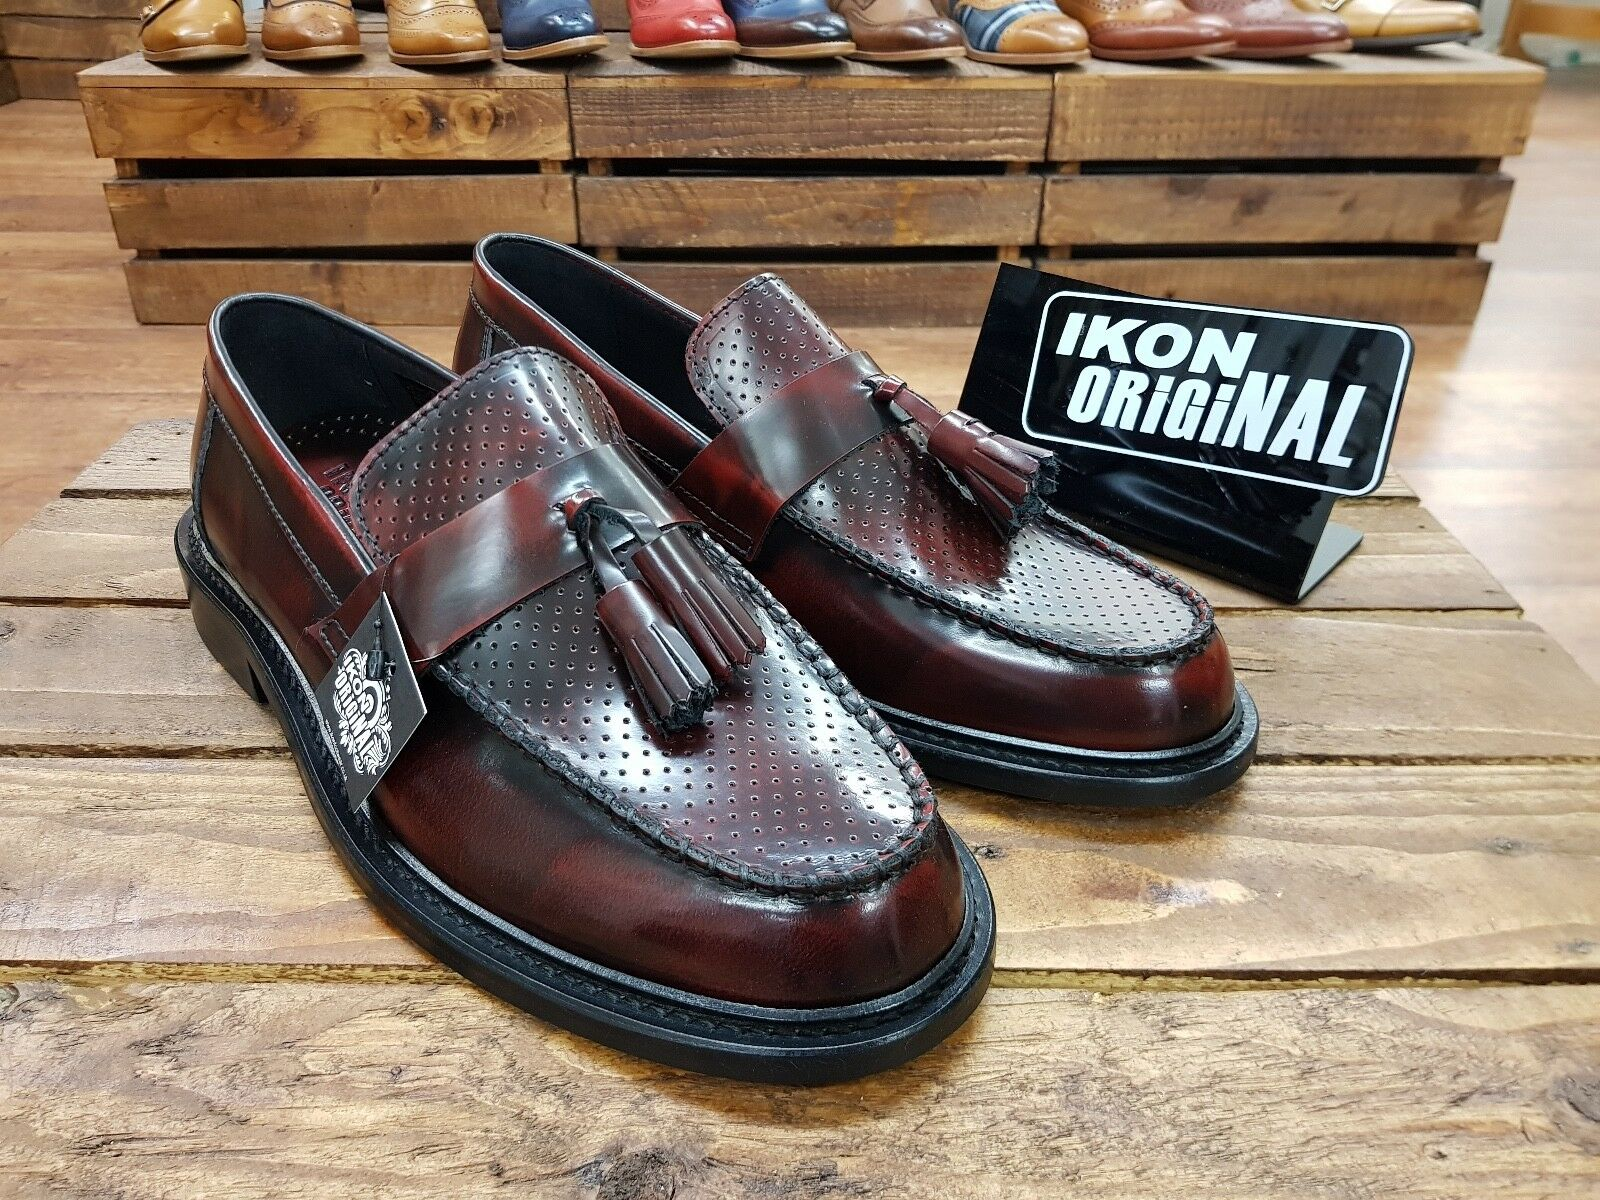 IKON ORIGINALS    Quad Punch    Mens Bordo tassel Loafers shoes    NEW